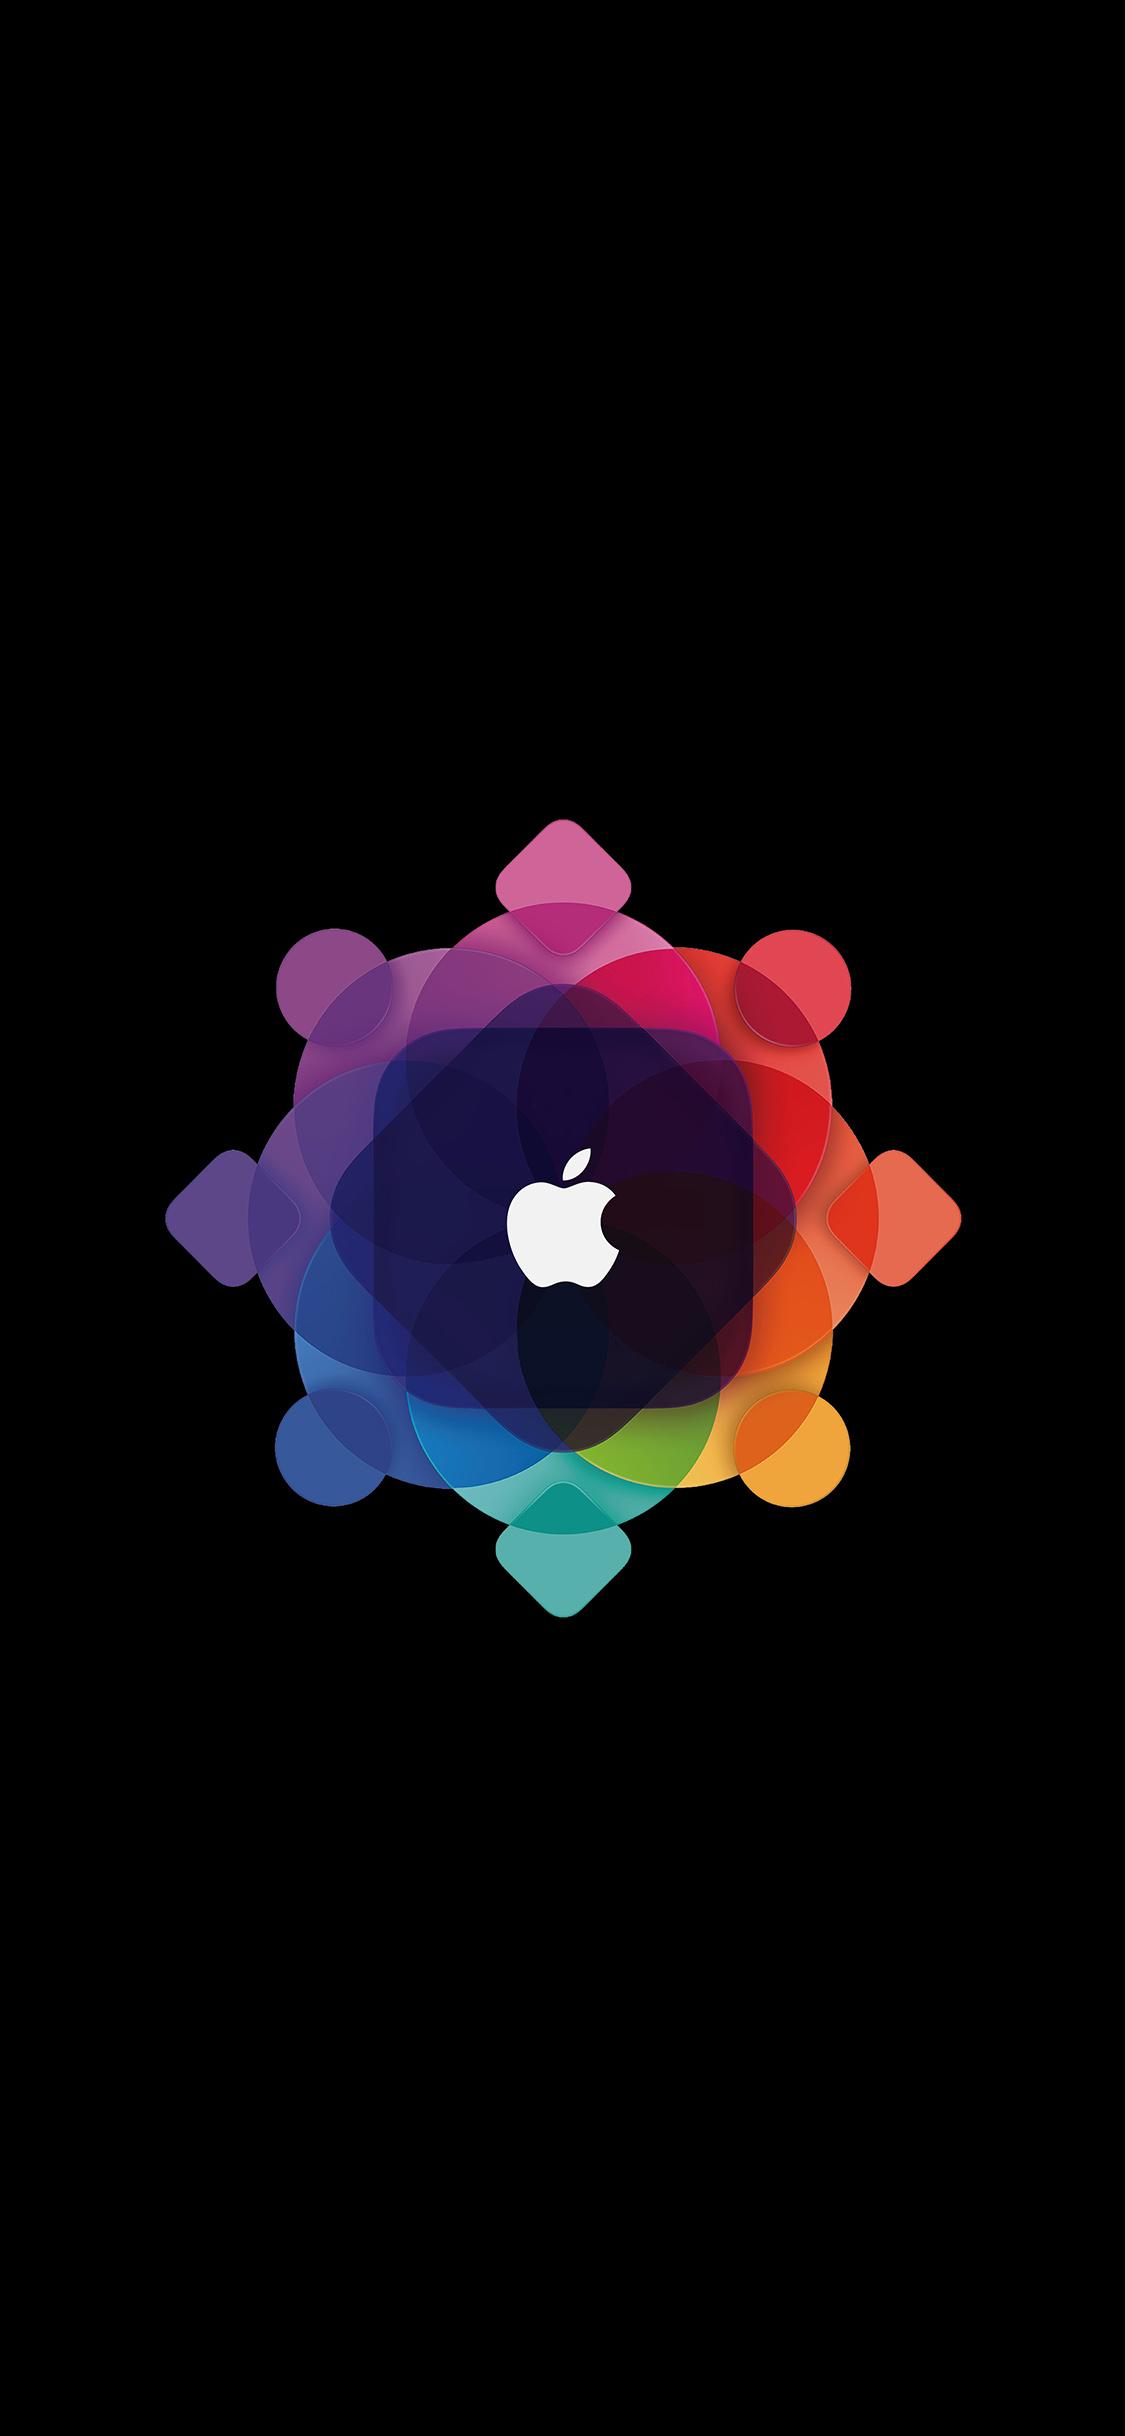 Al56 Apple Wwdc Art Logo Minimal Dark Wallpaper